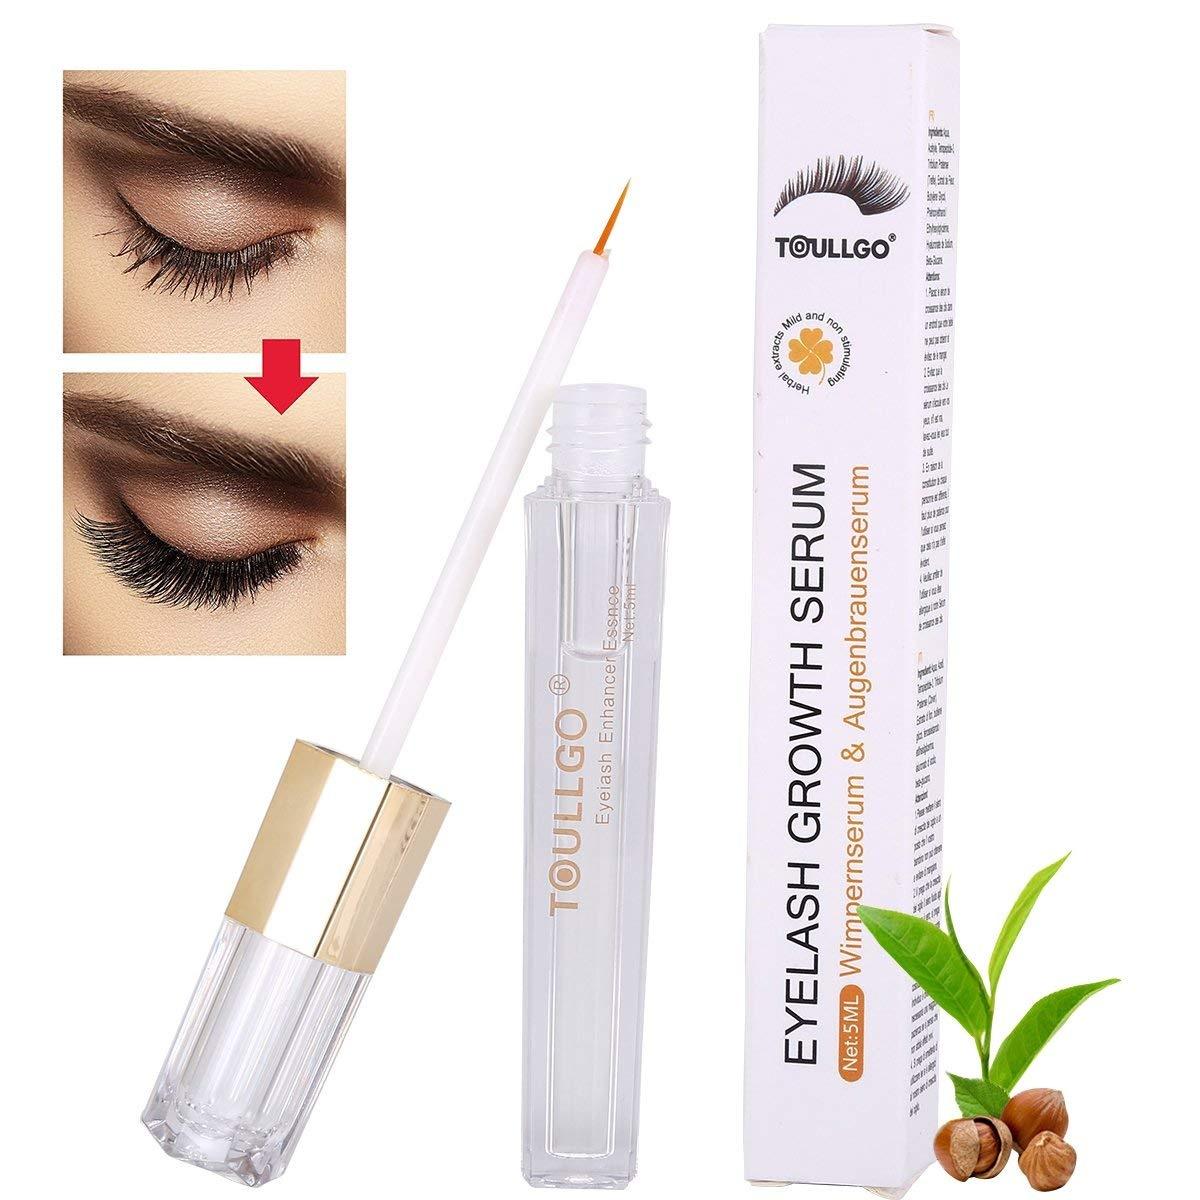 236dd47ccea Eyelash Enhancer, eyelash growth serum, Lash & Brow Booster Serum ...